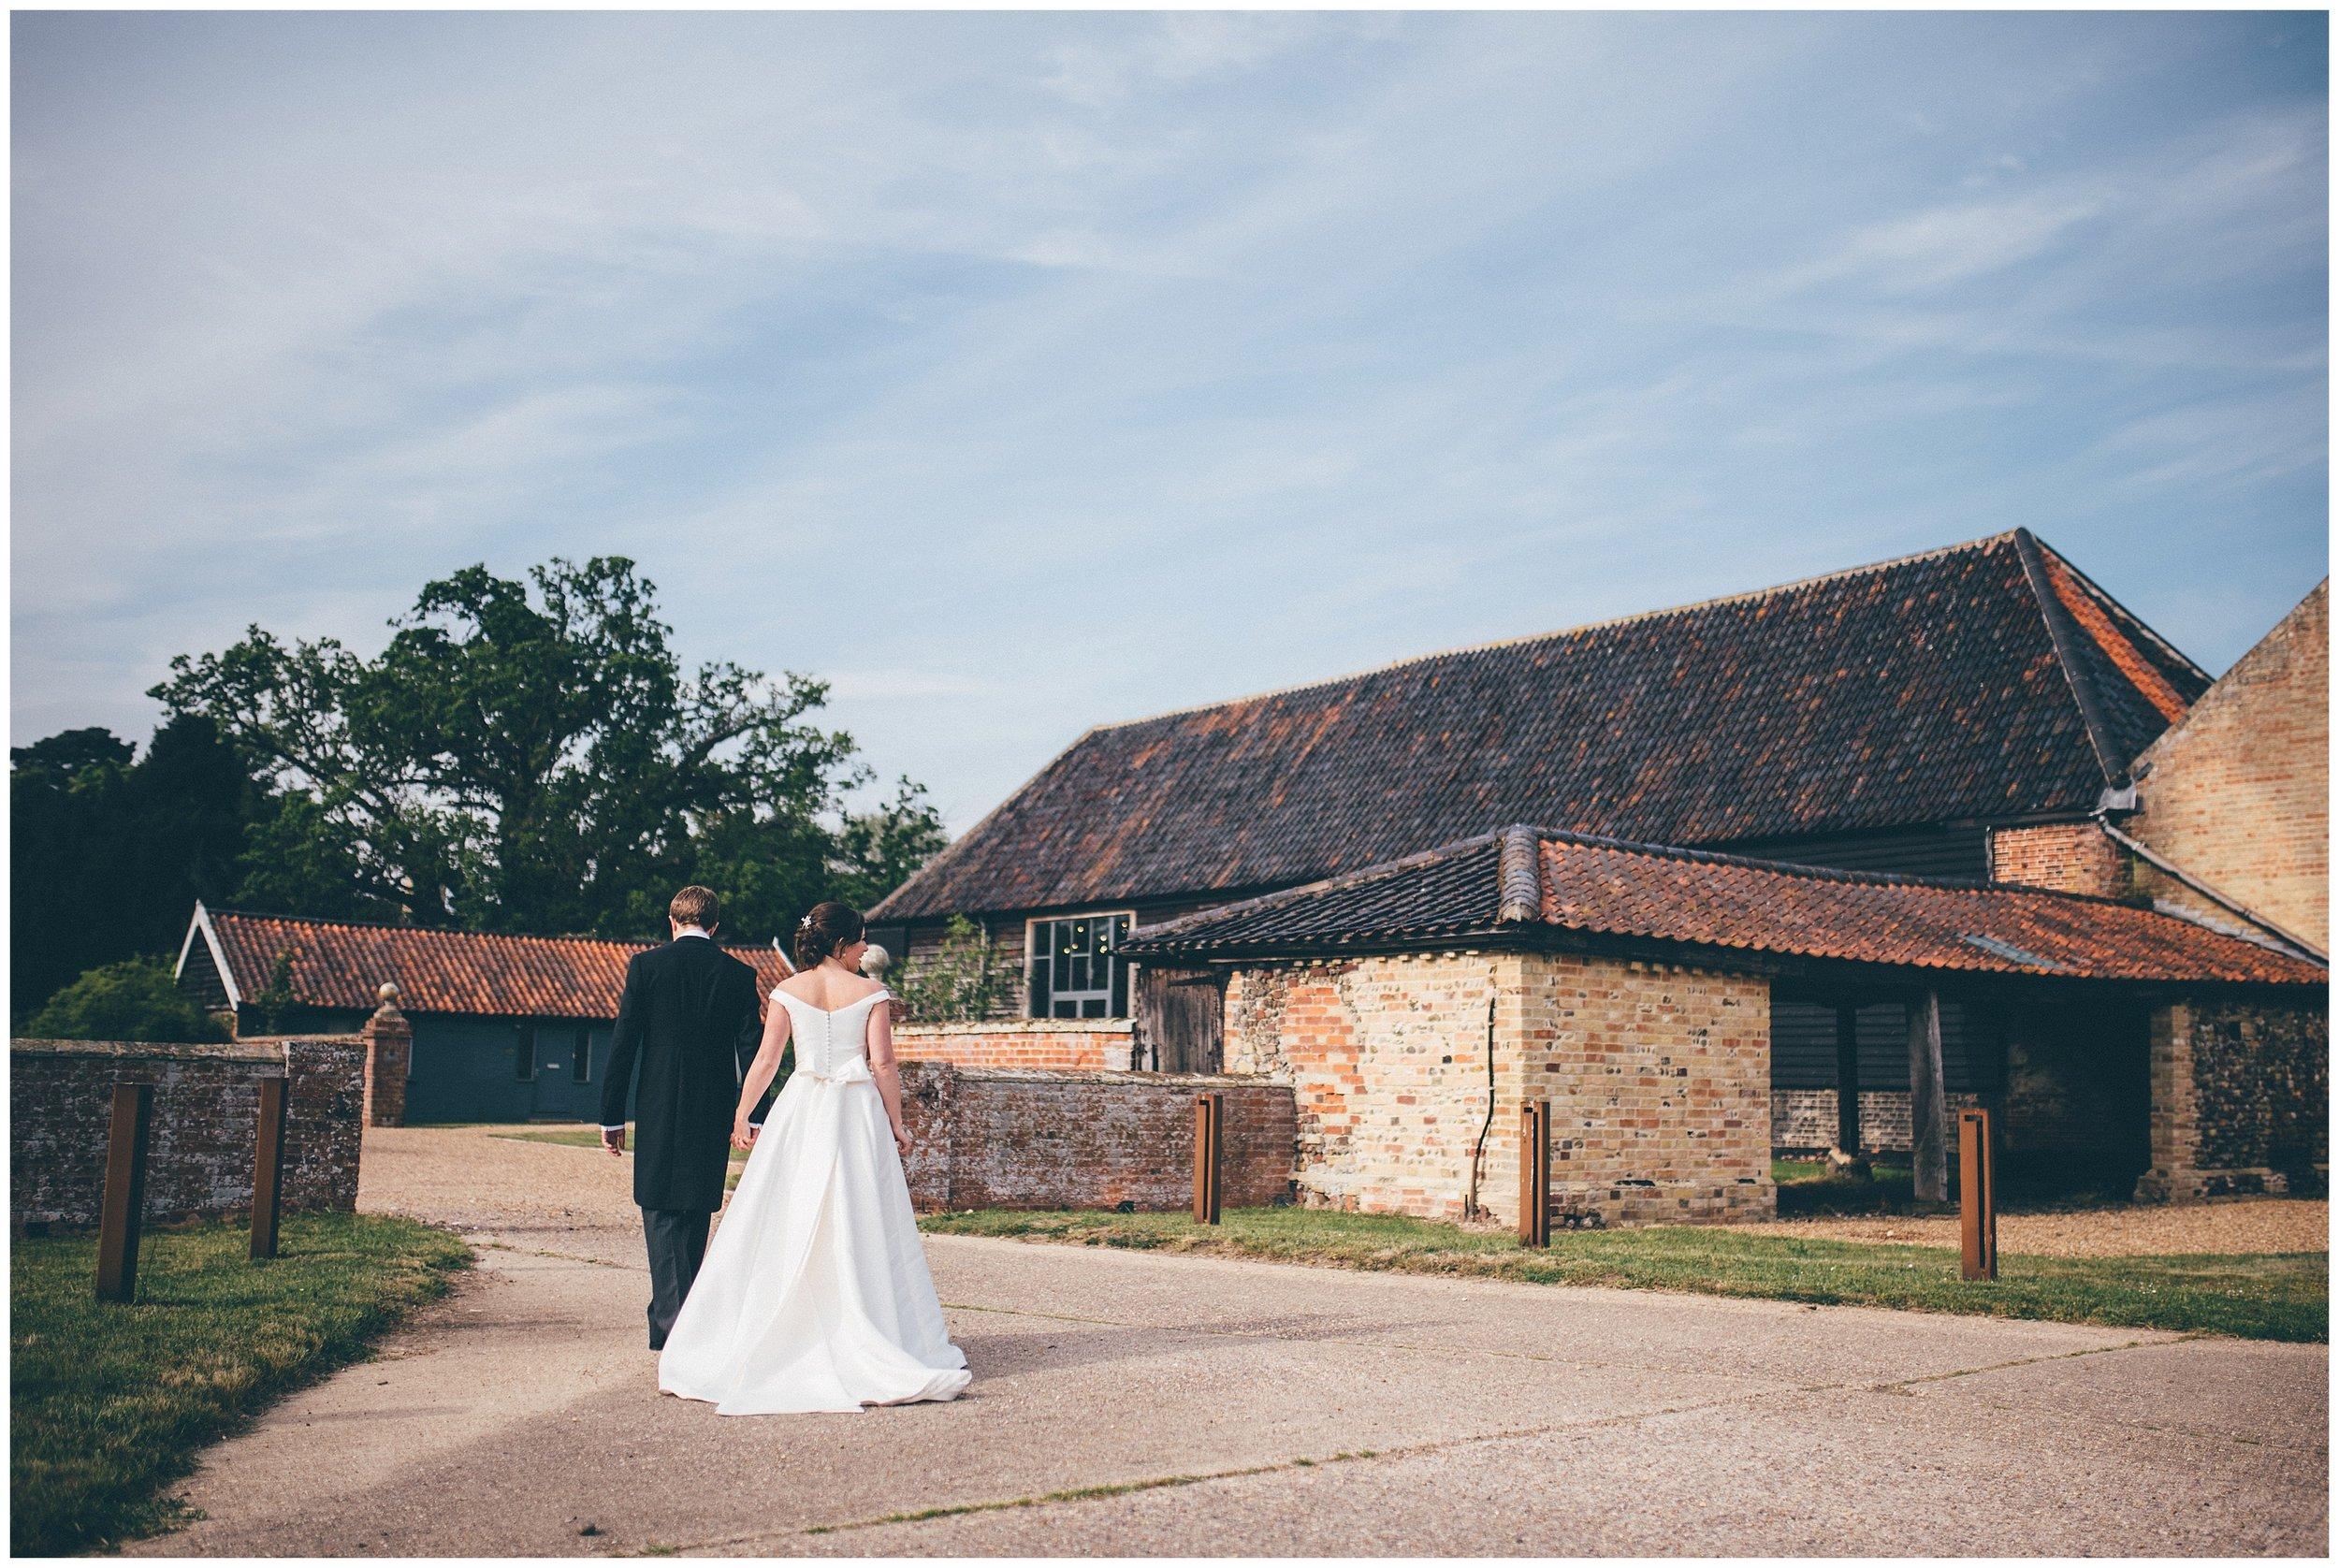 Bride and groom have their wedding photographs taken at Henham Park wedding barns.